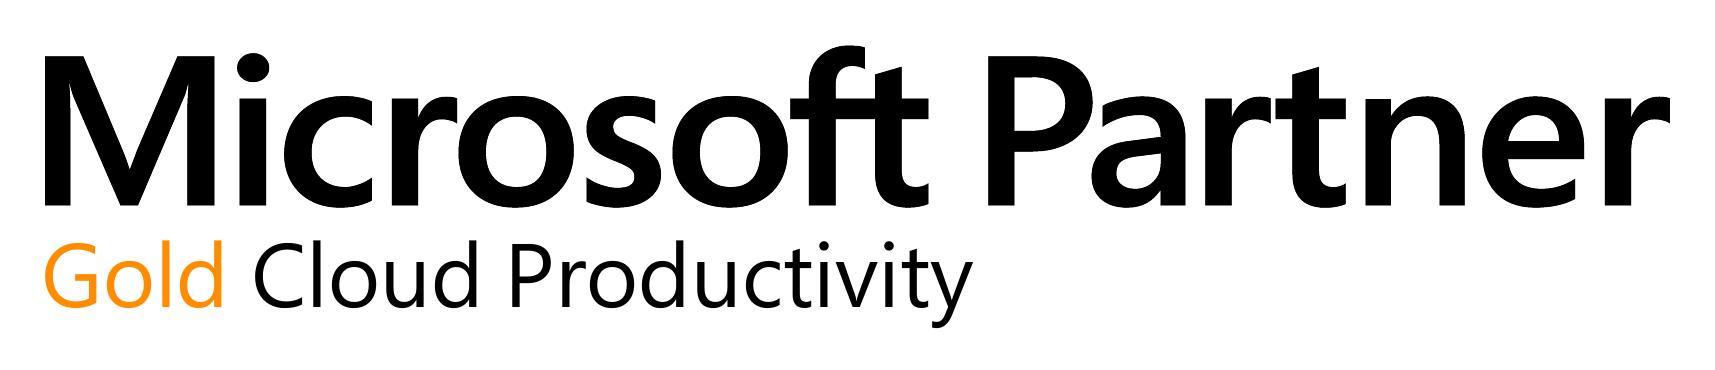 Microsoft GOLD Cloud Productivity - Sharing Minds